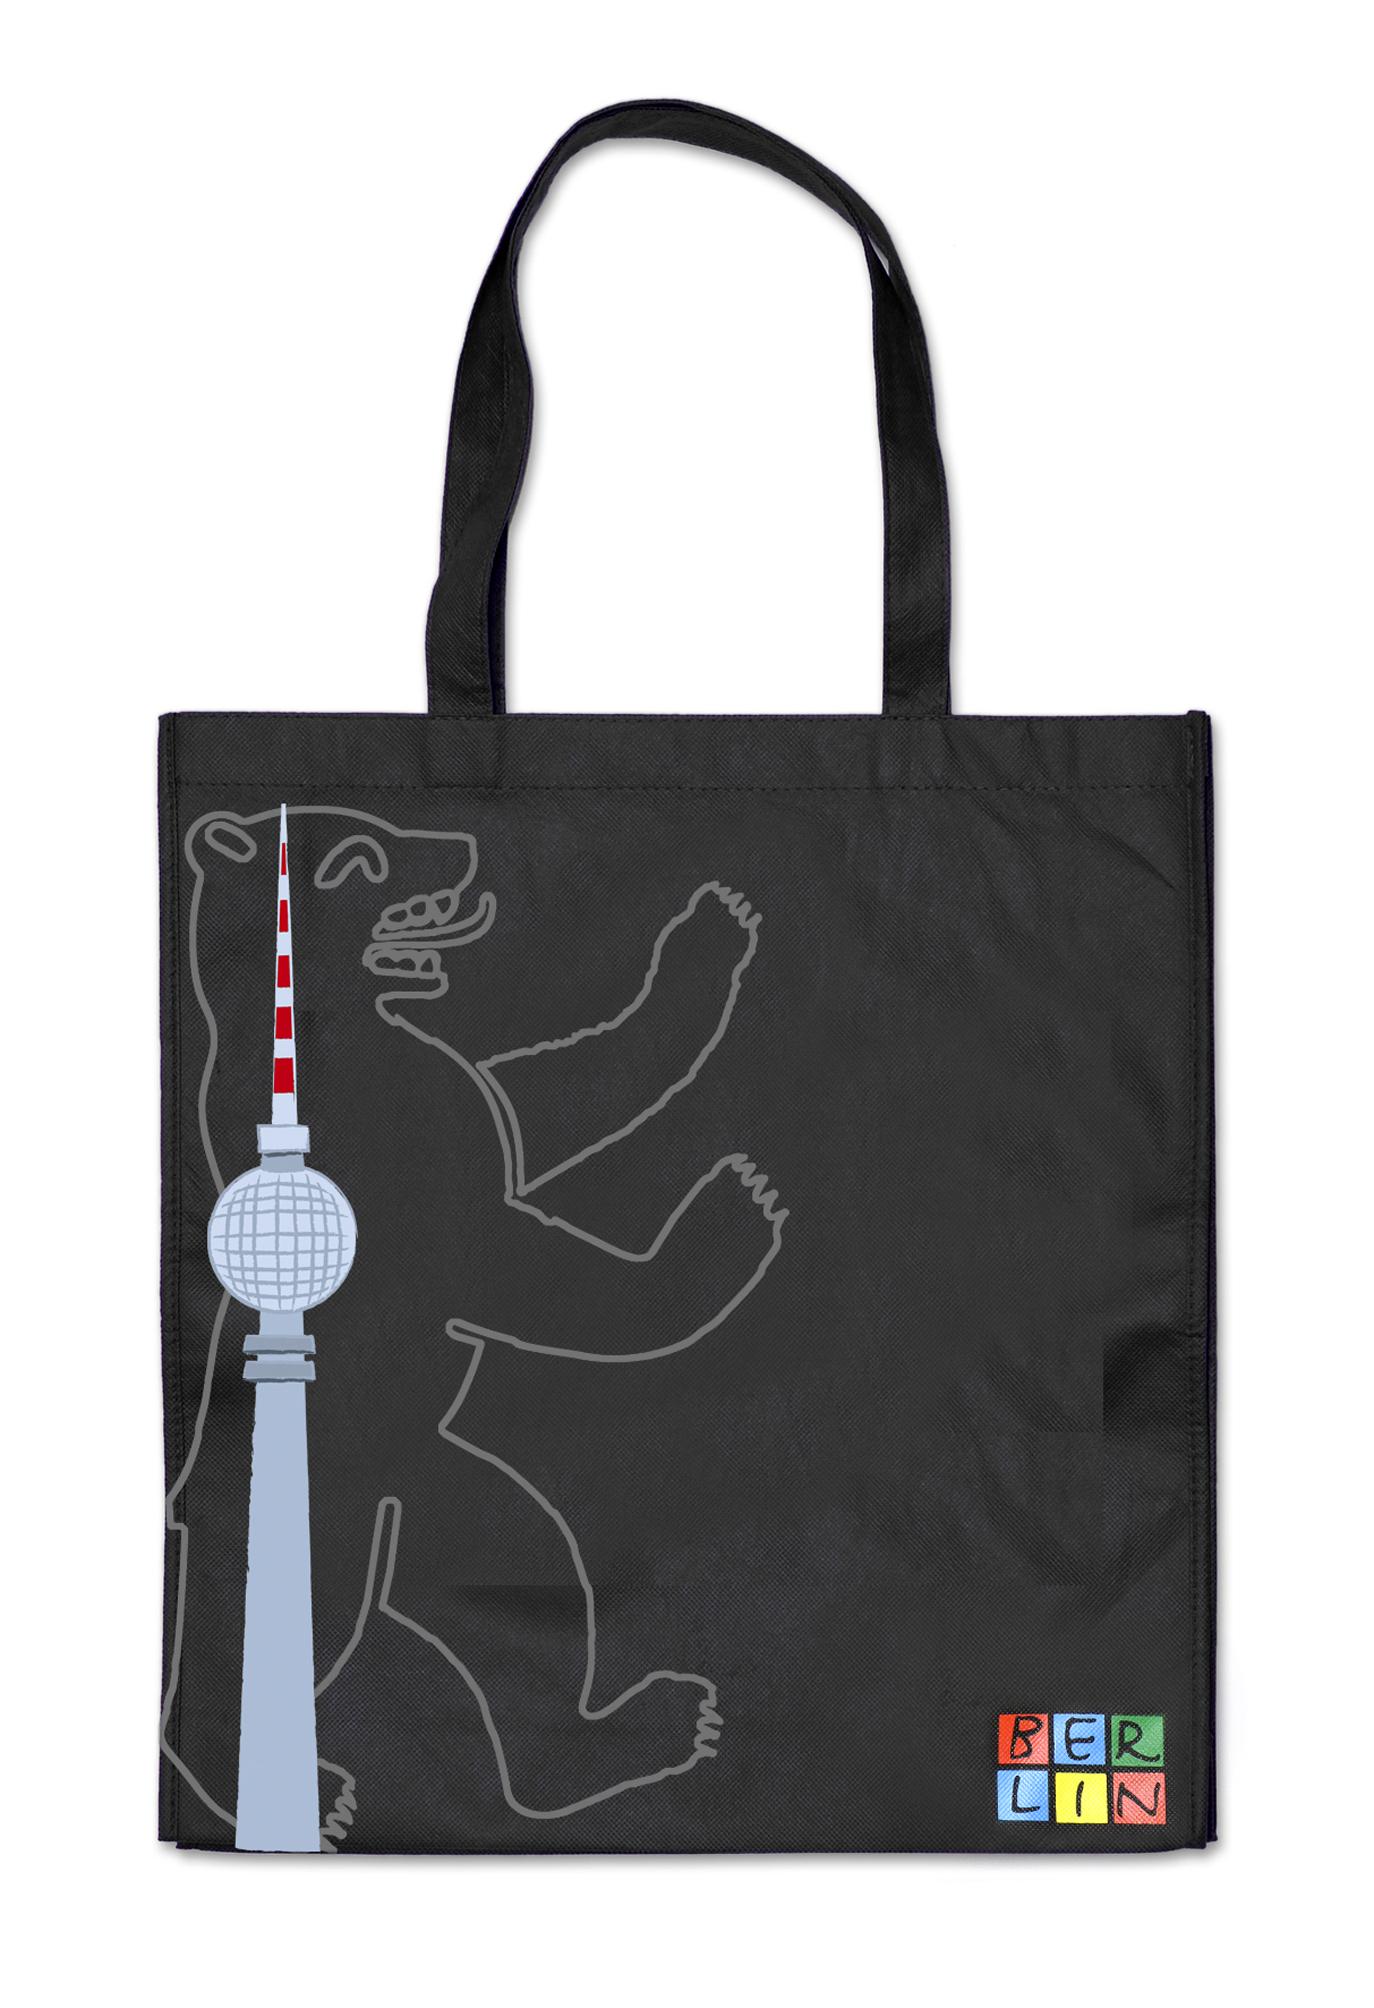 Shoppingbag BERLIN Bär TV-Turm schwarz-grau